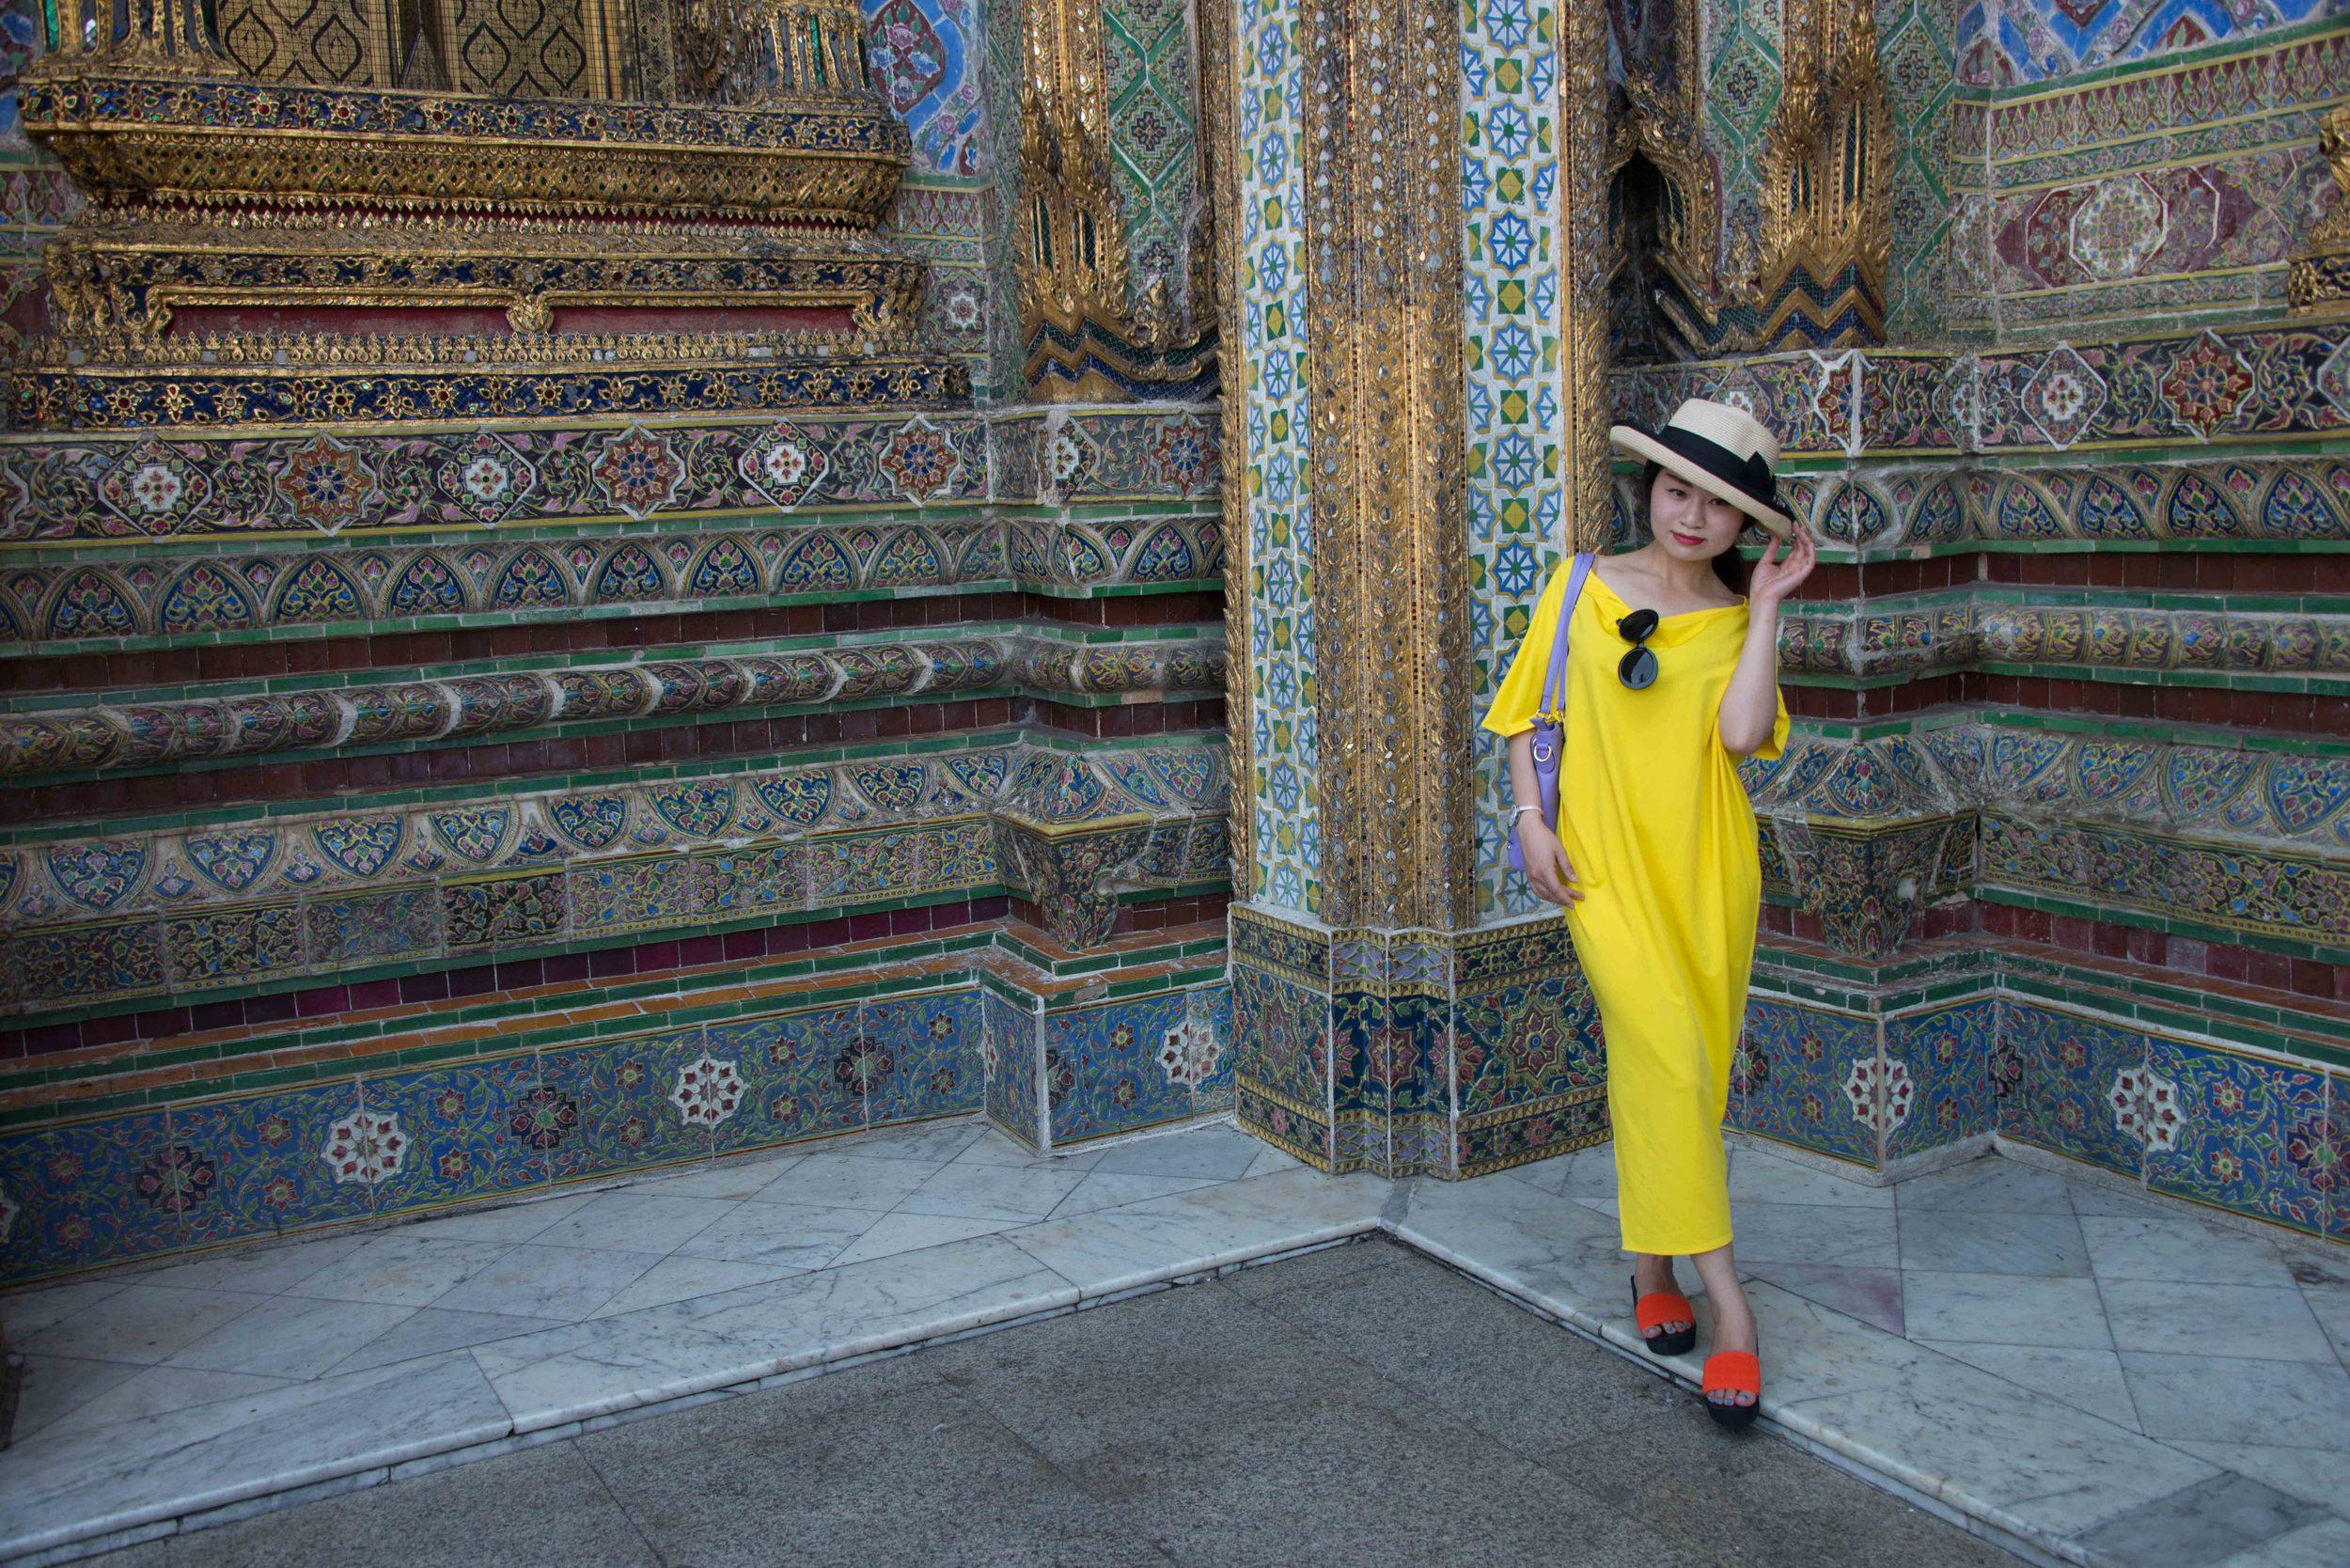 fellow tourist at Royal Palace, Bangkok